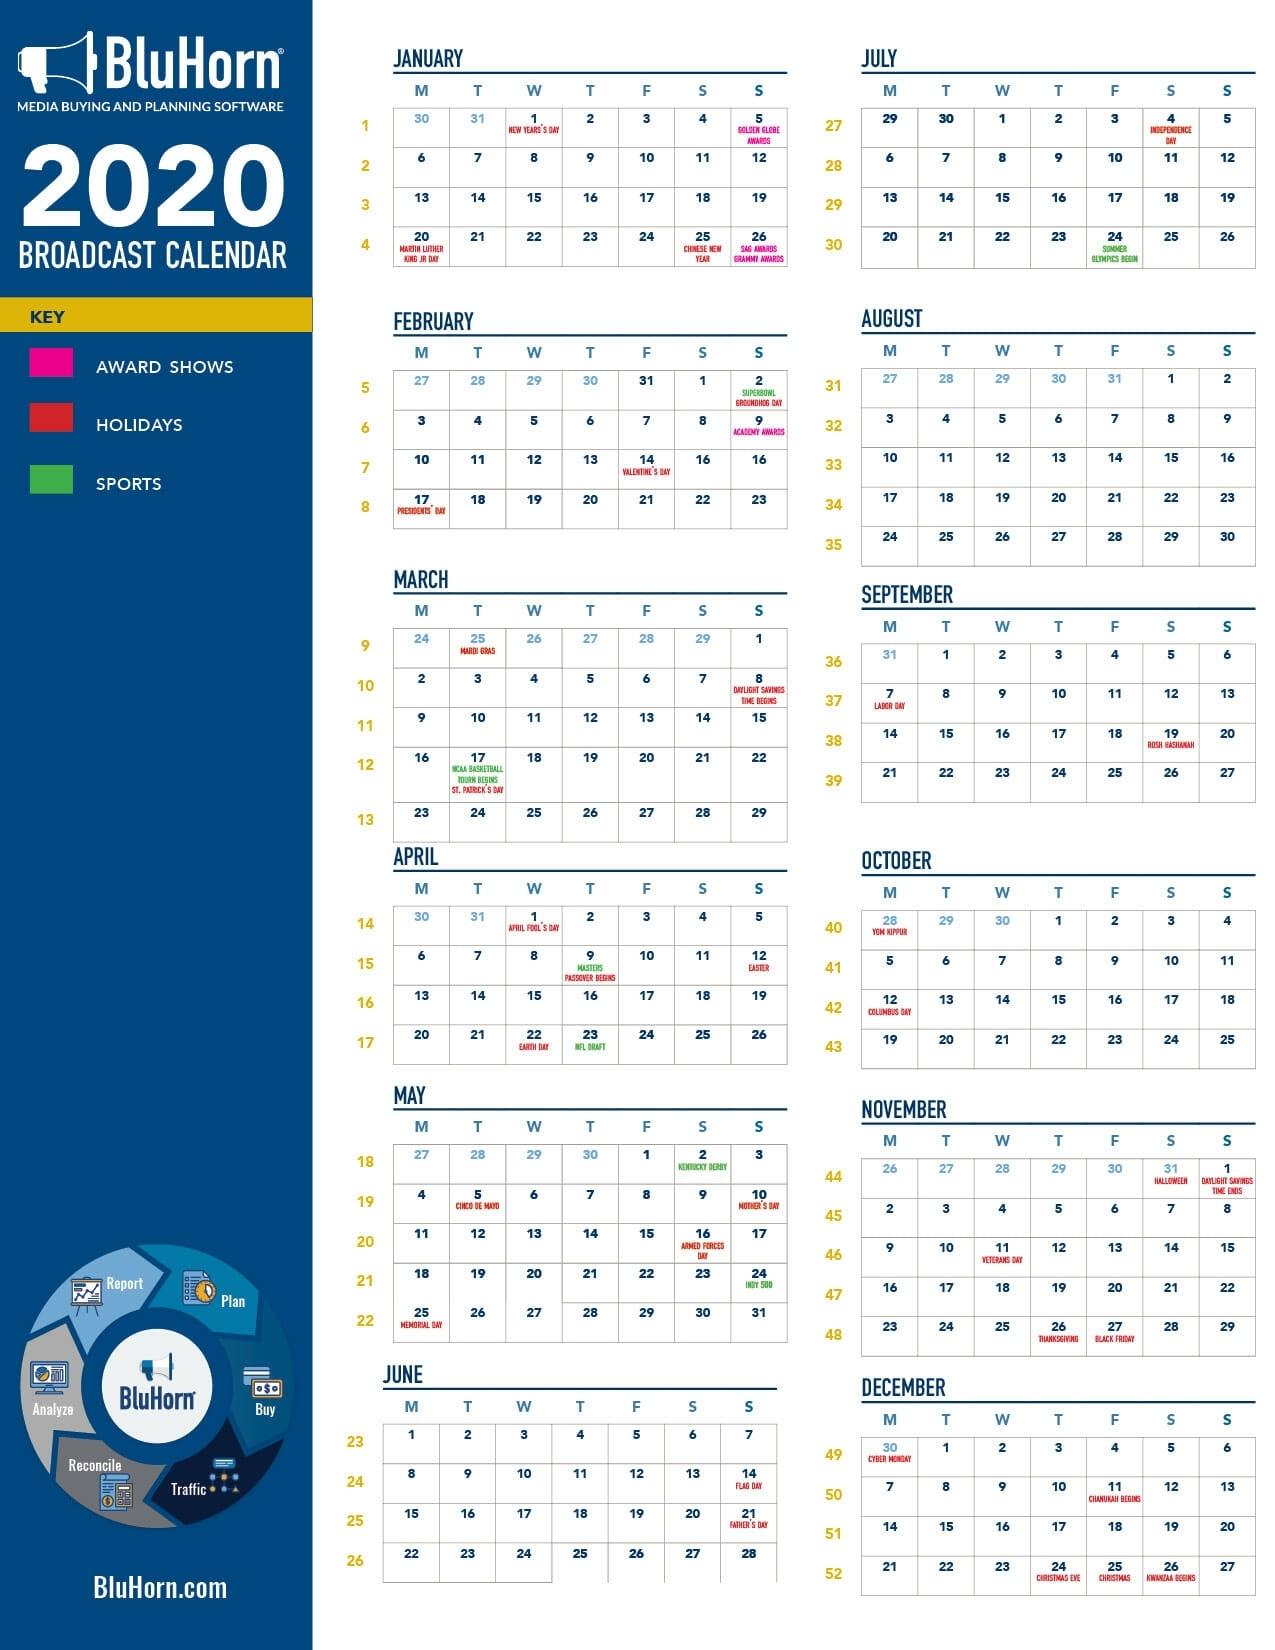 Free Broadcast Calendar   Bluhorn Print 2021 Broadcast Calendar